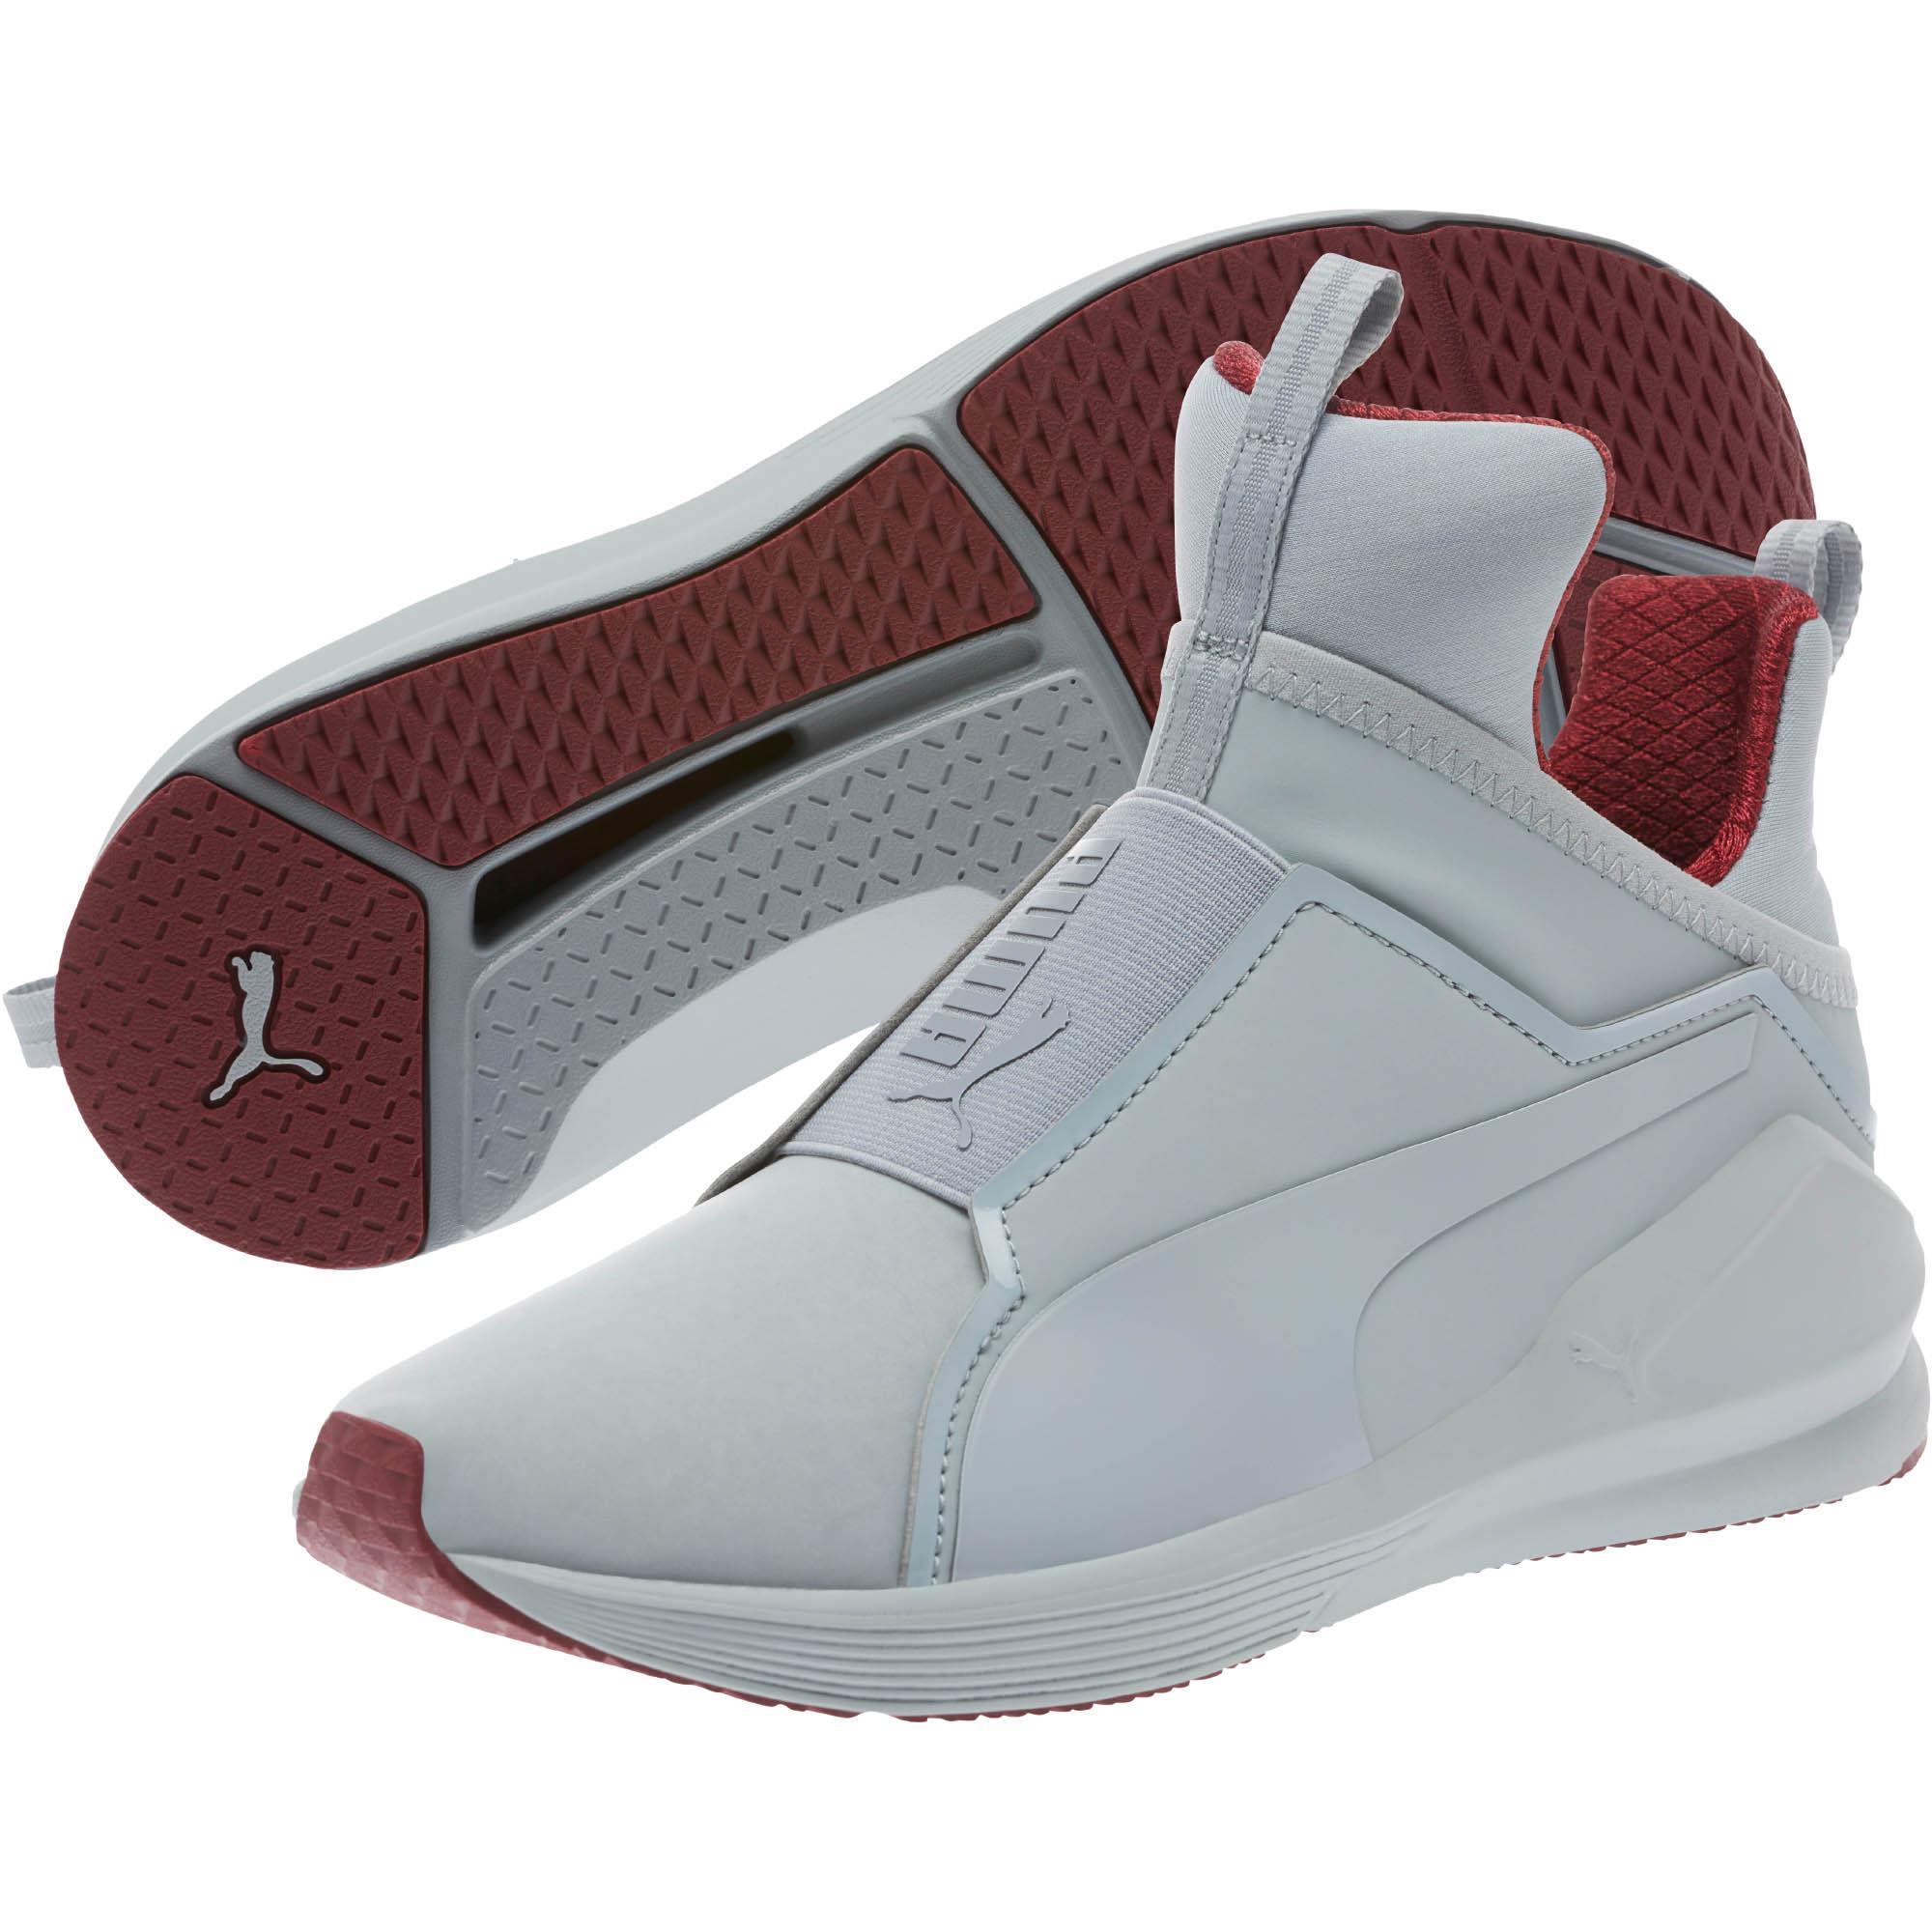 Lyst - Puma Fierce Nubuck Naturals Women s Training Shoes b0bdb149c